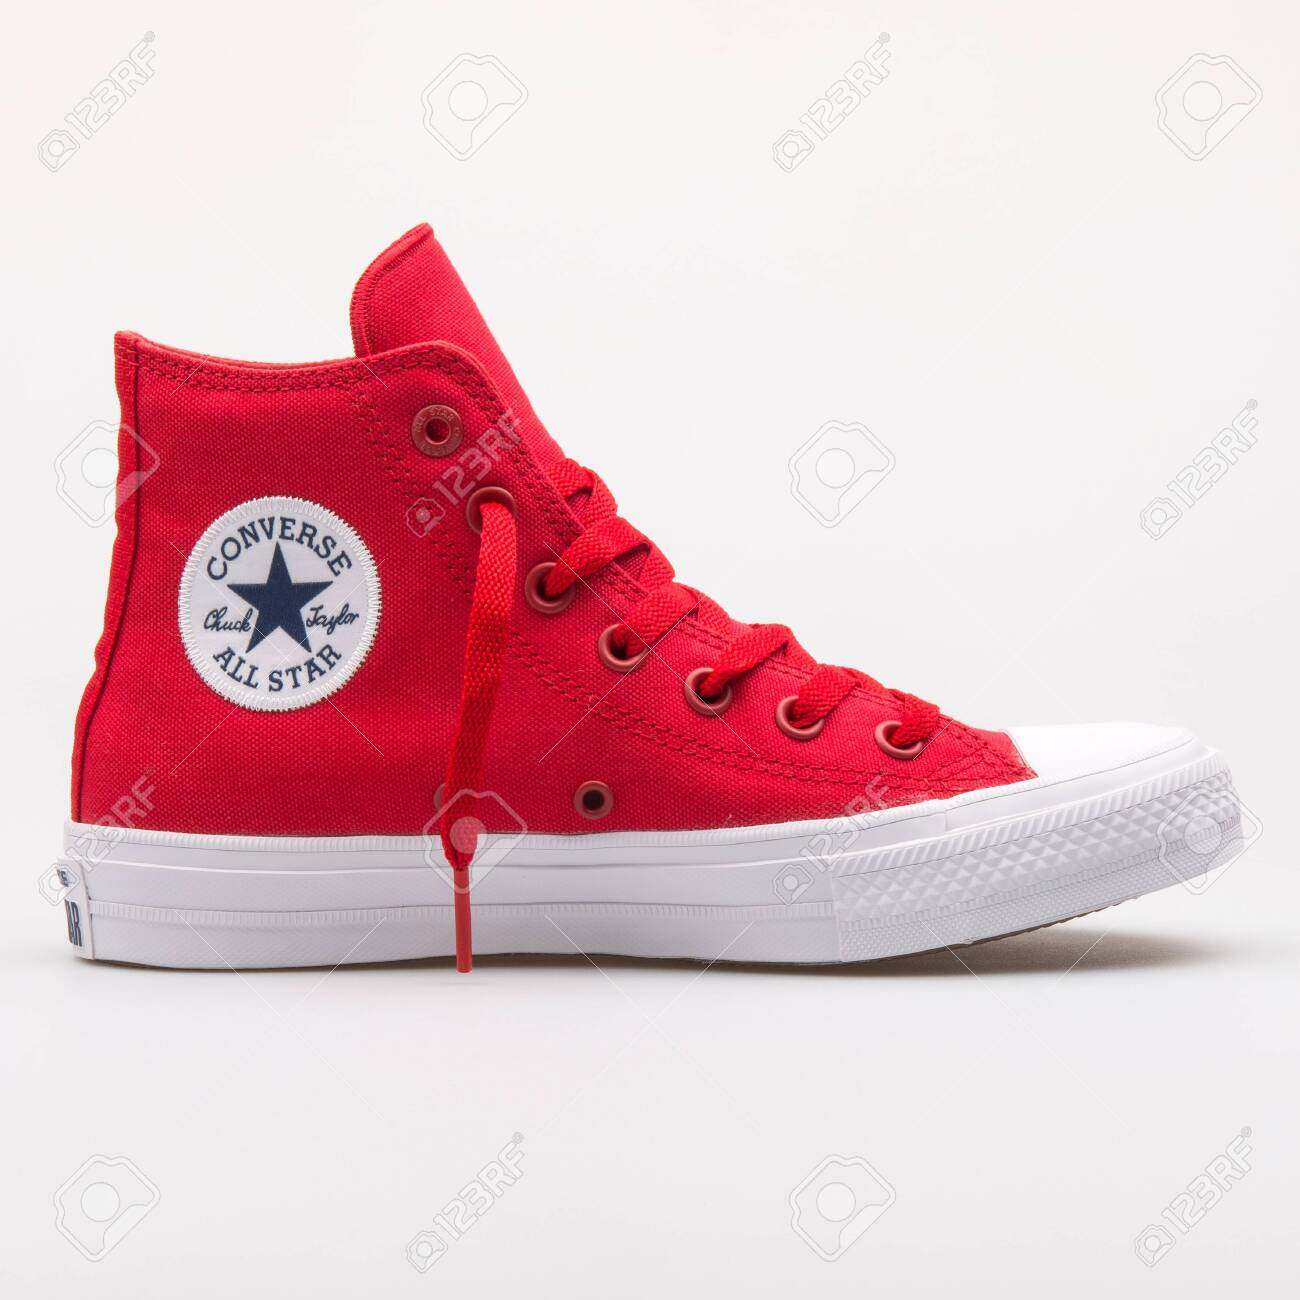 converse chuck ii red - 61% OFF